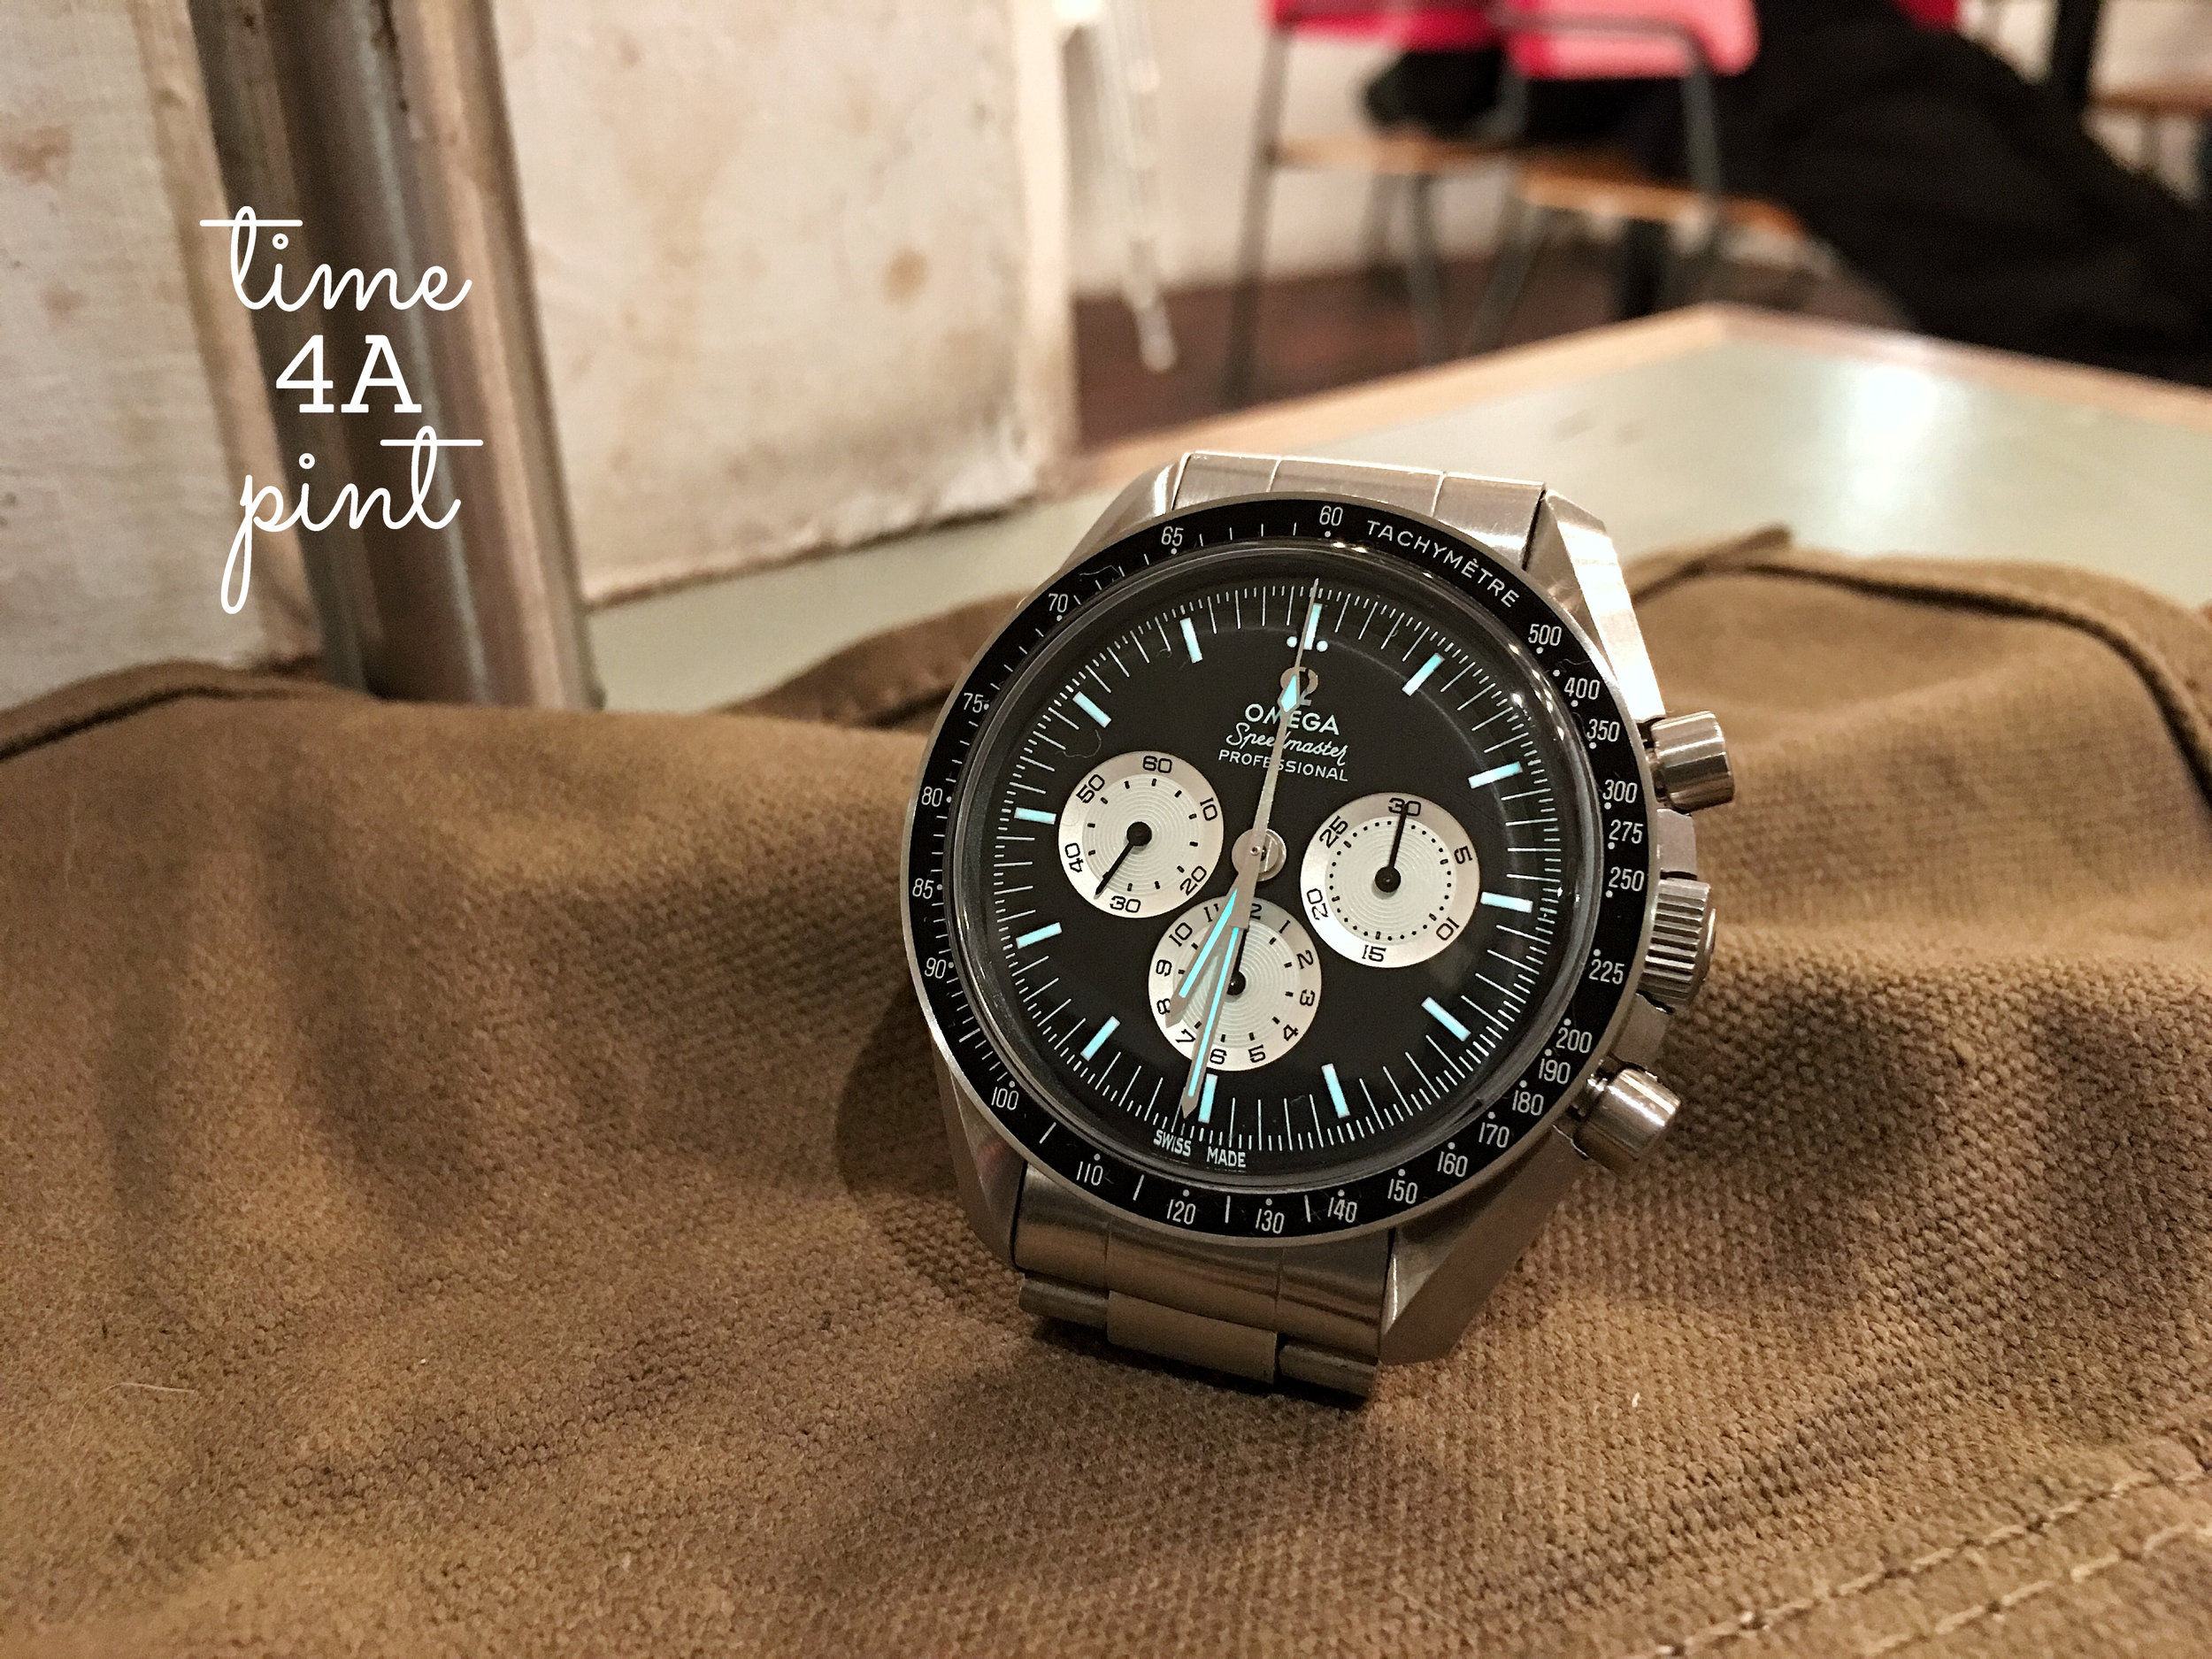 Omega Speedmaster Speedy Tuesday Limited Edition